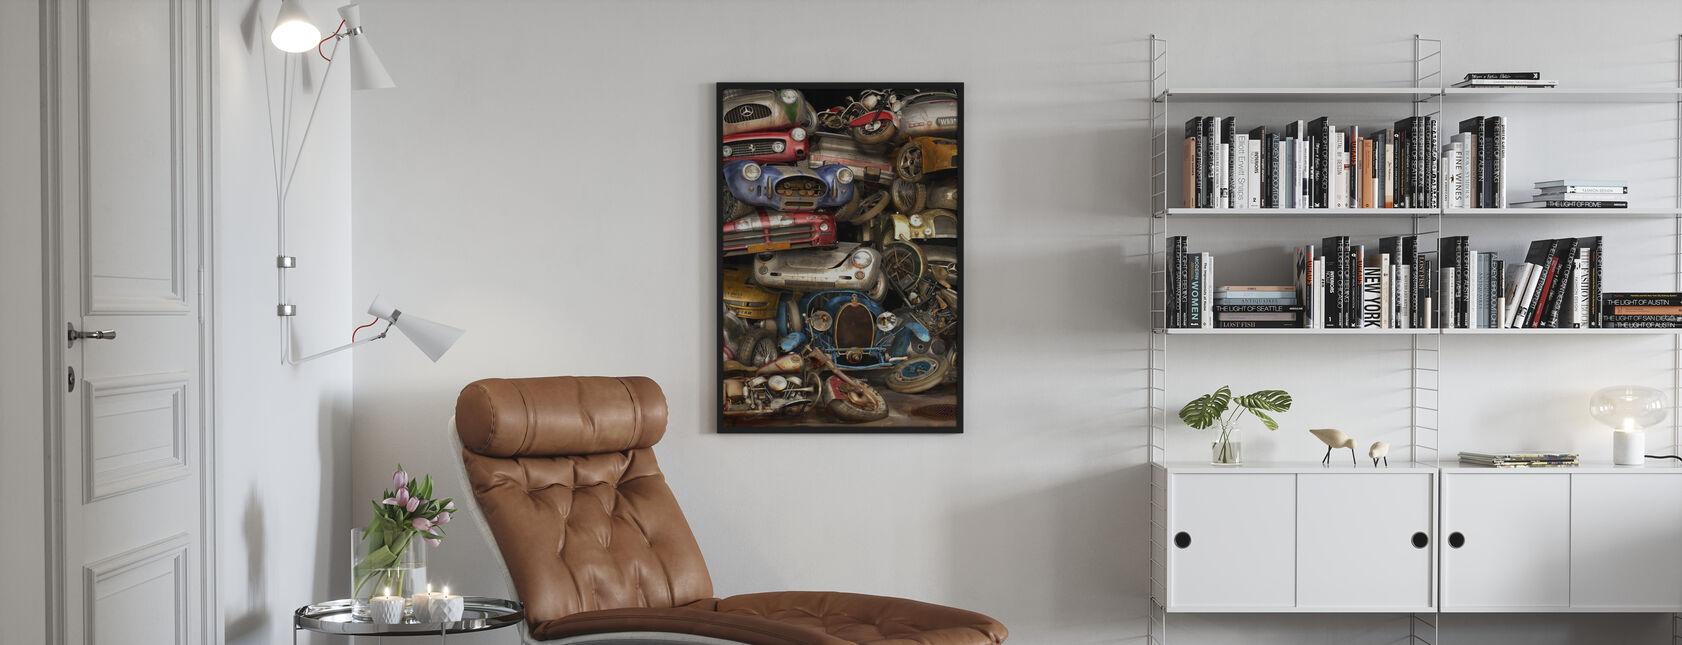 Recycling - Framed print - Living Room